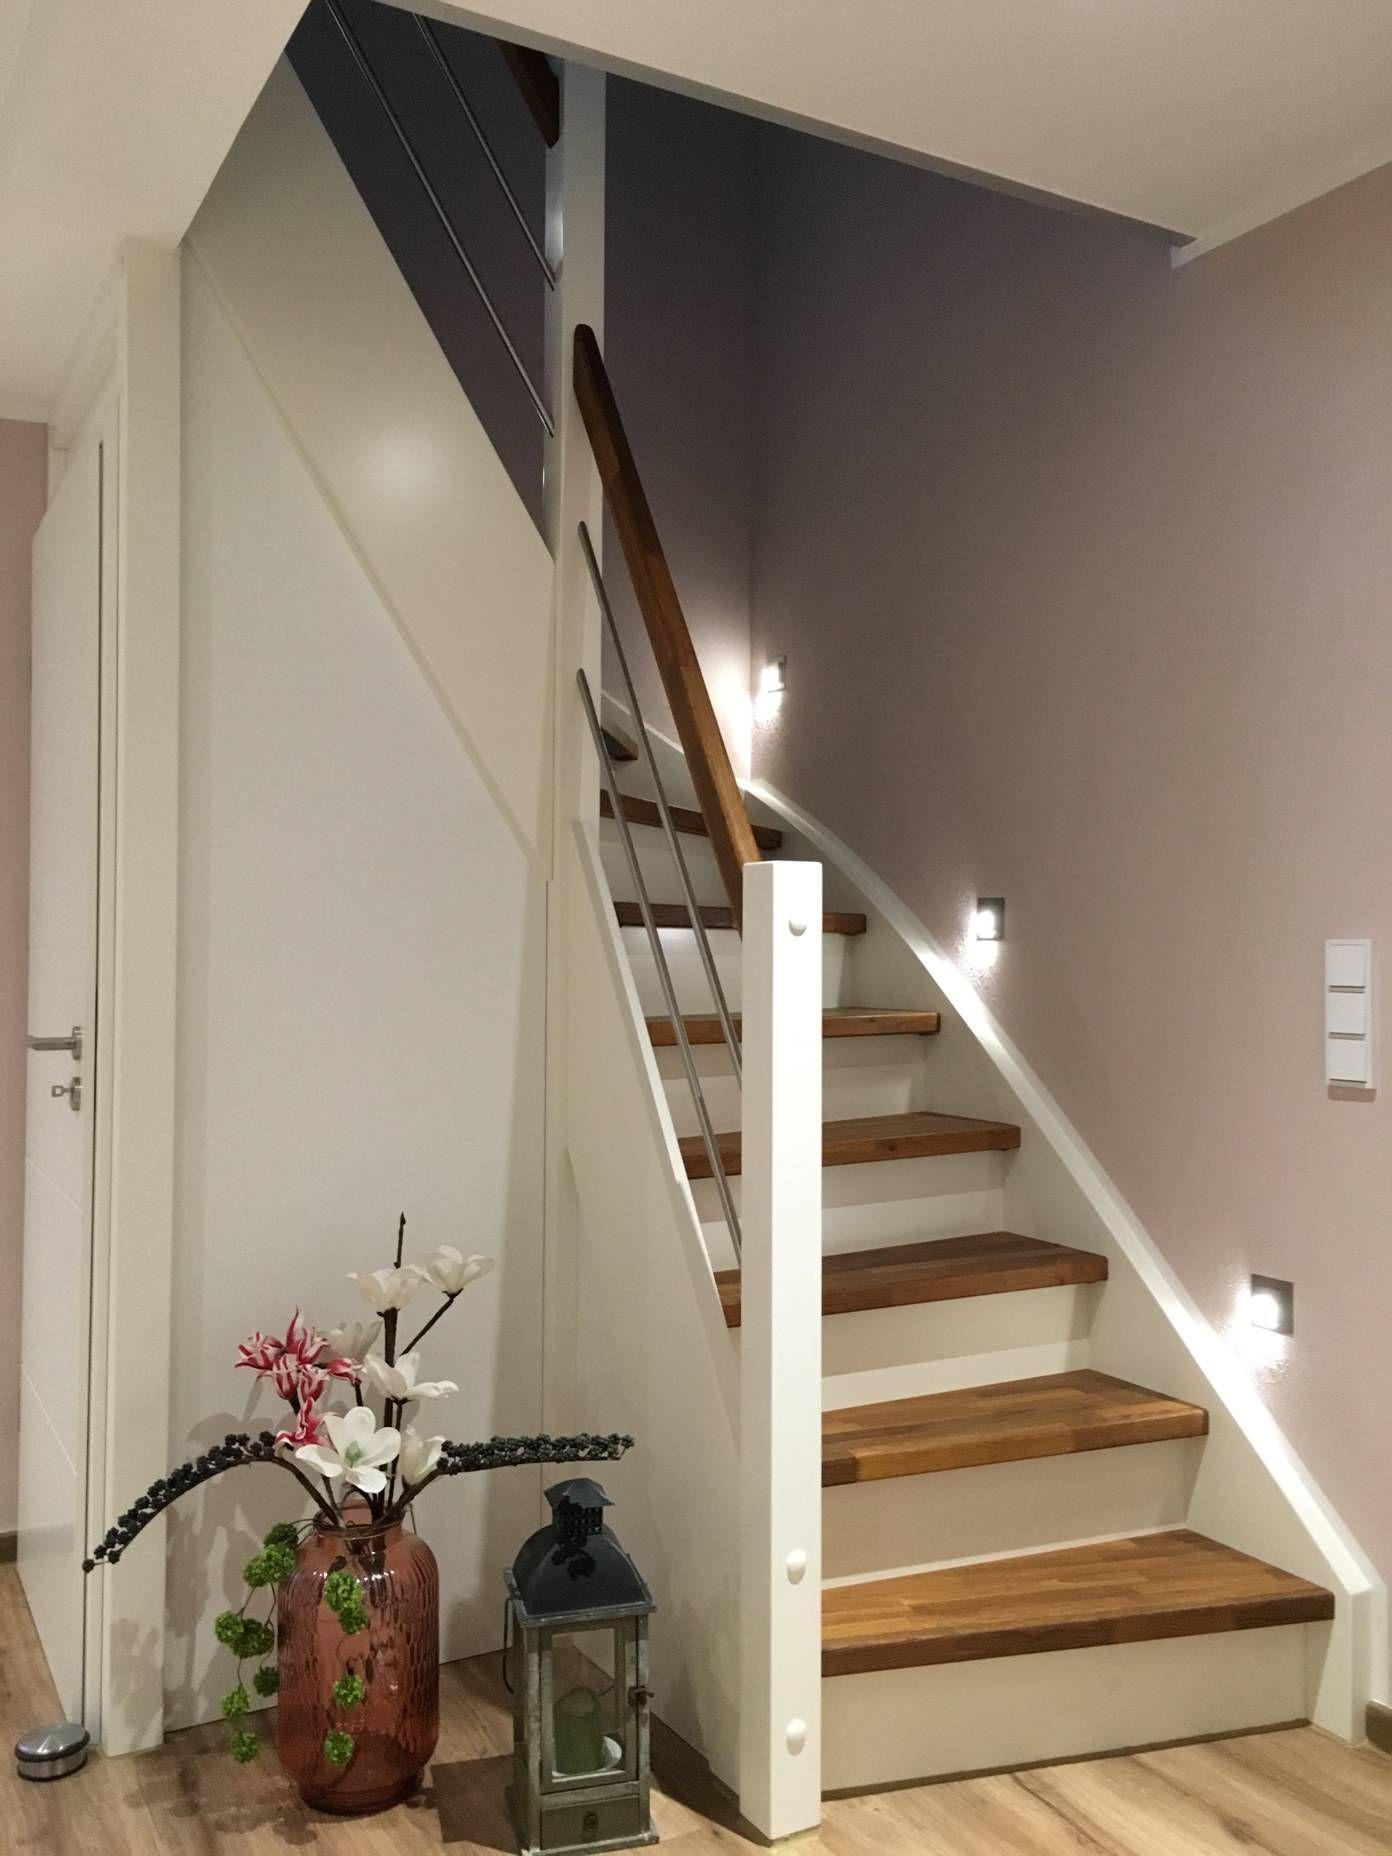 jenniches treppen. Black Bedroom Furniture Sets. Home Design Ideas